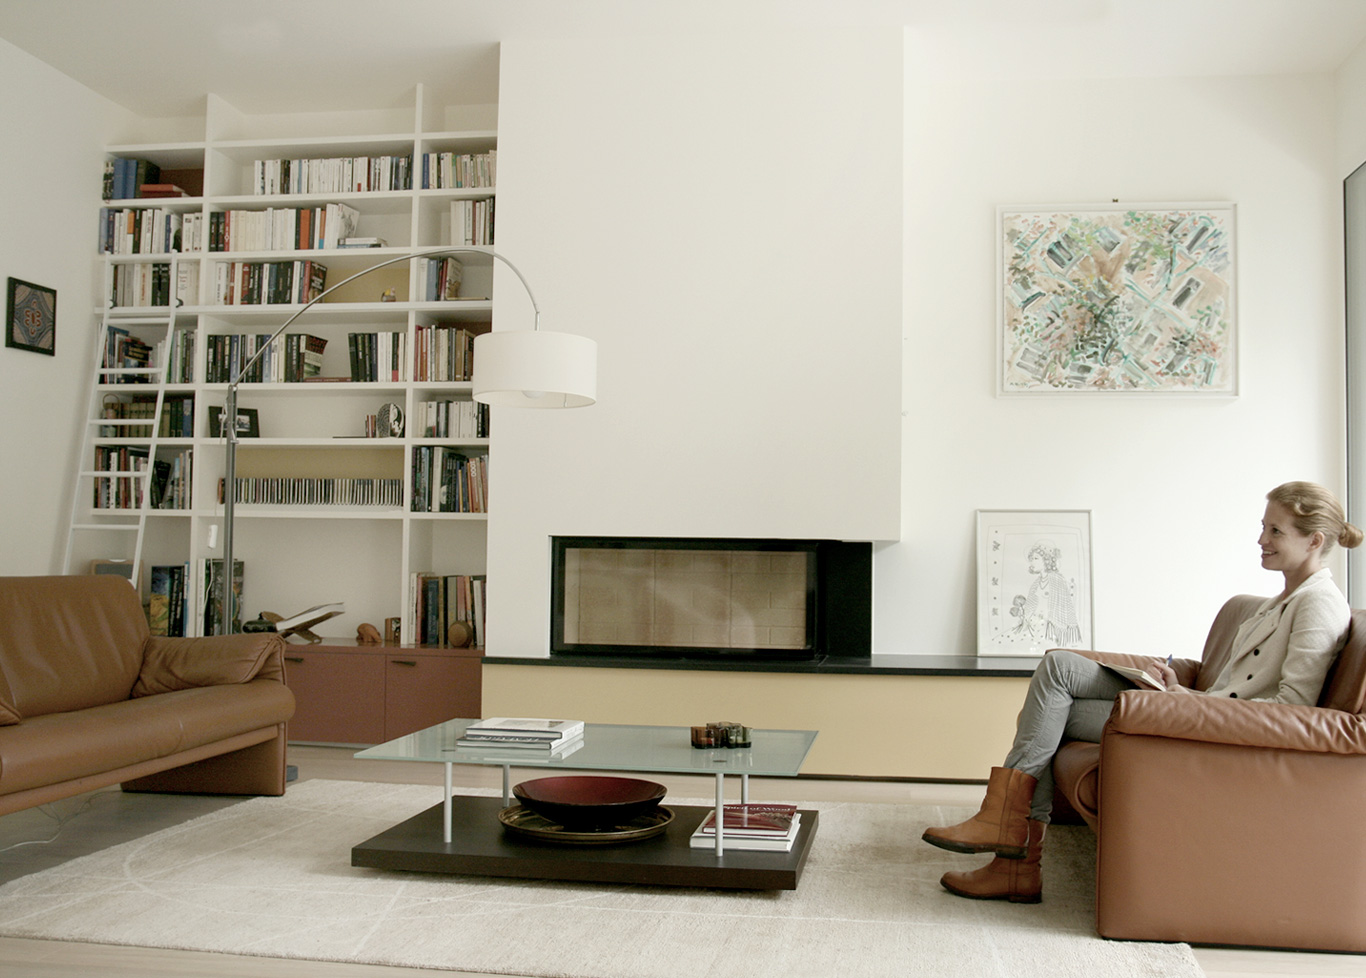 chiara colombini boutique design. Black Bedroom Furniture Sets. Home Design Ideas